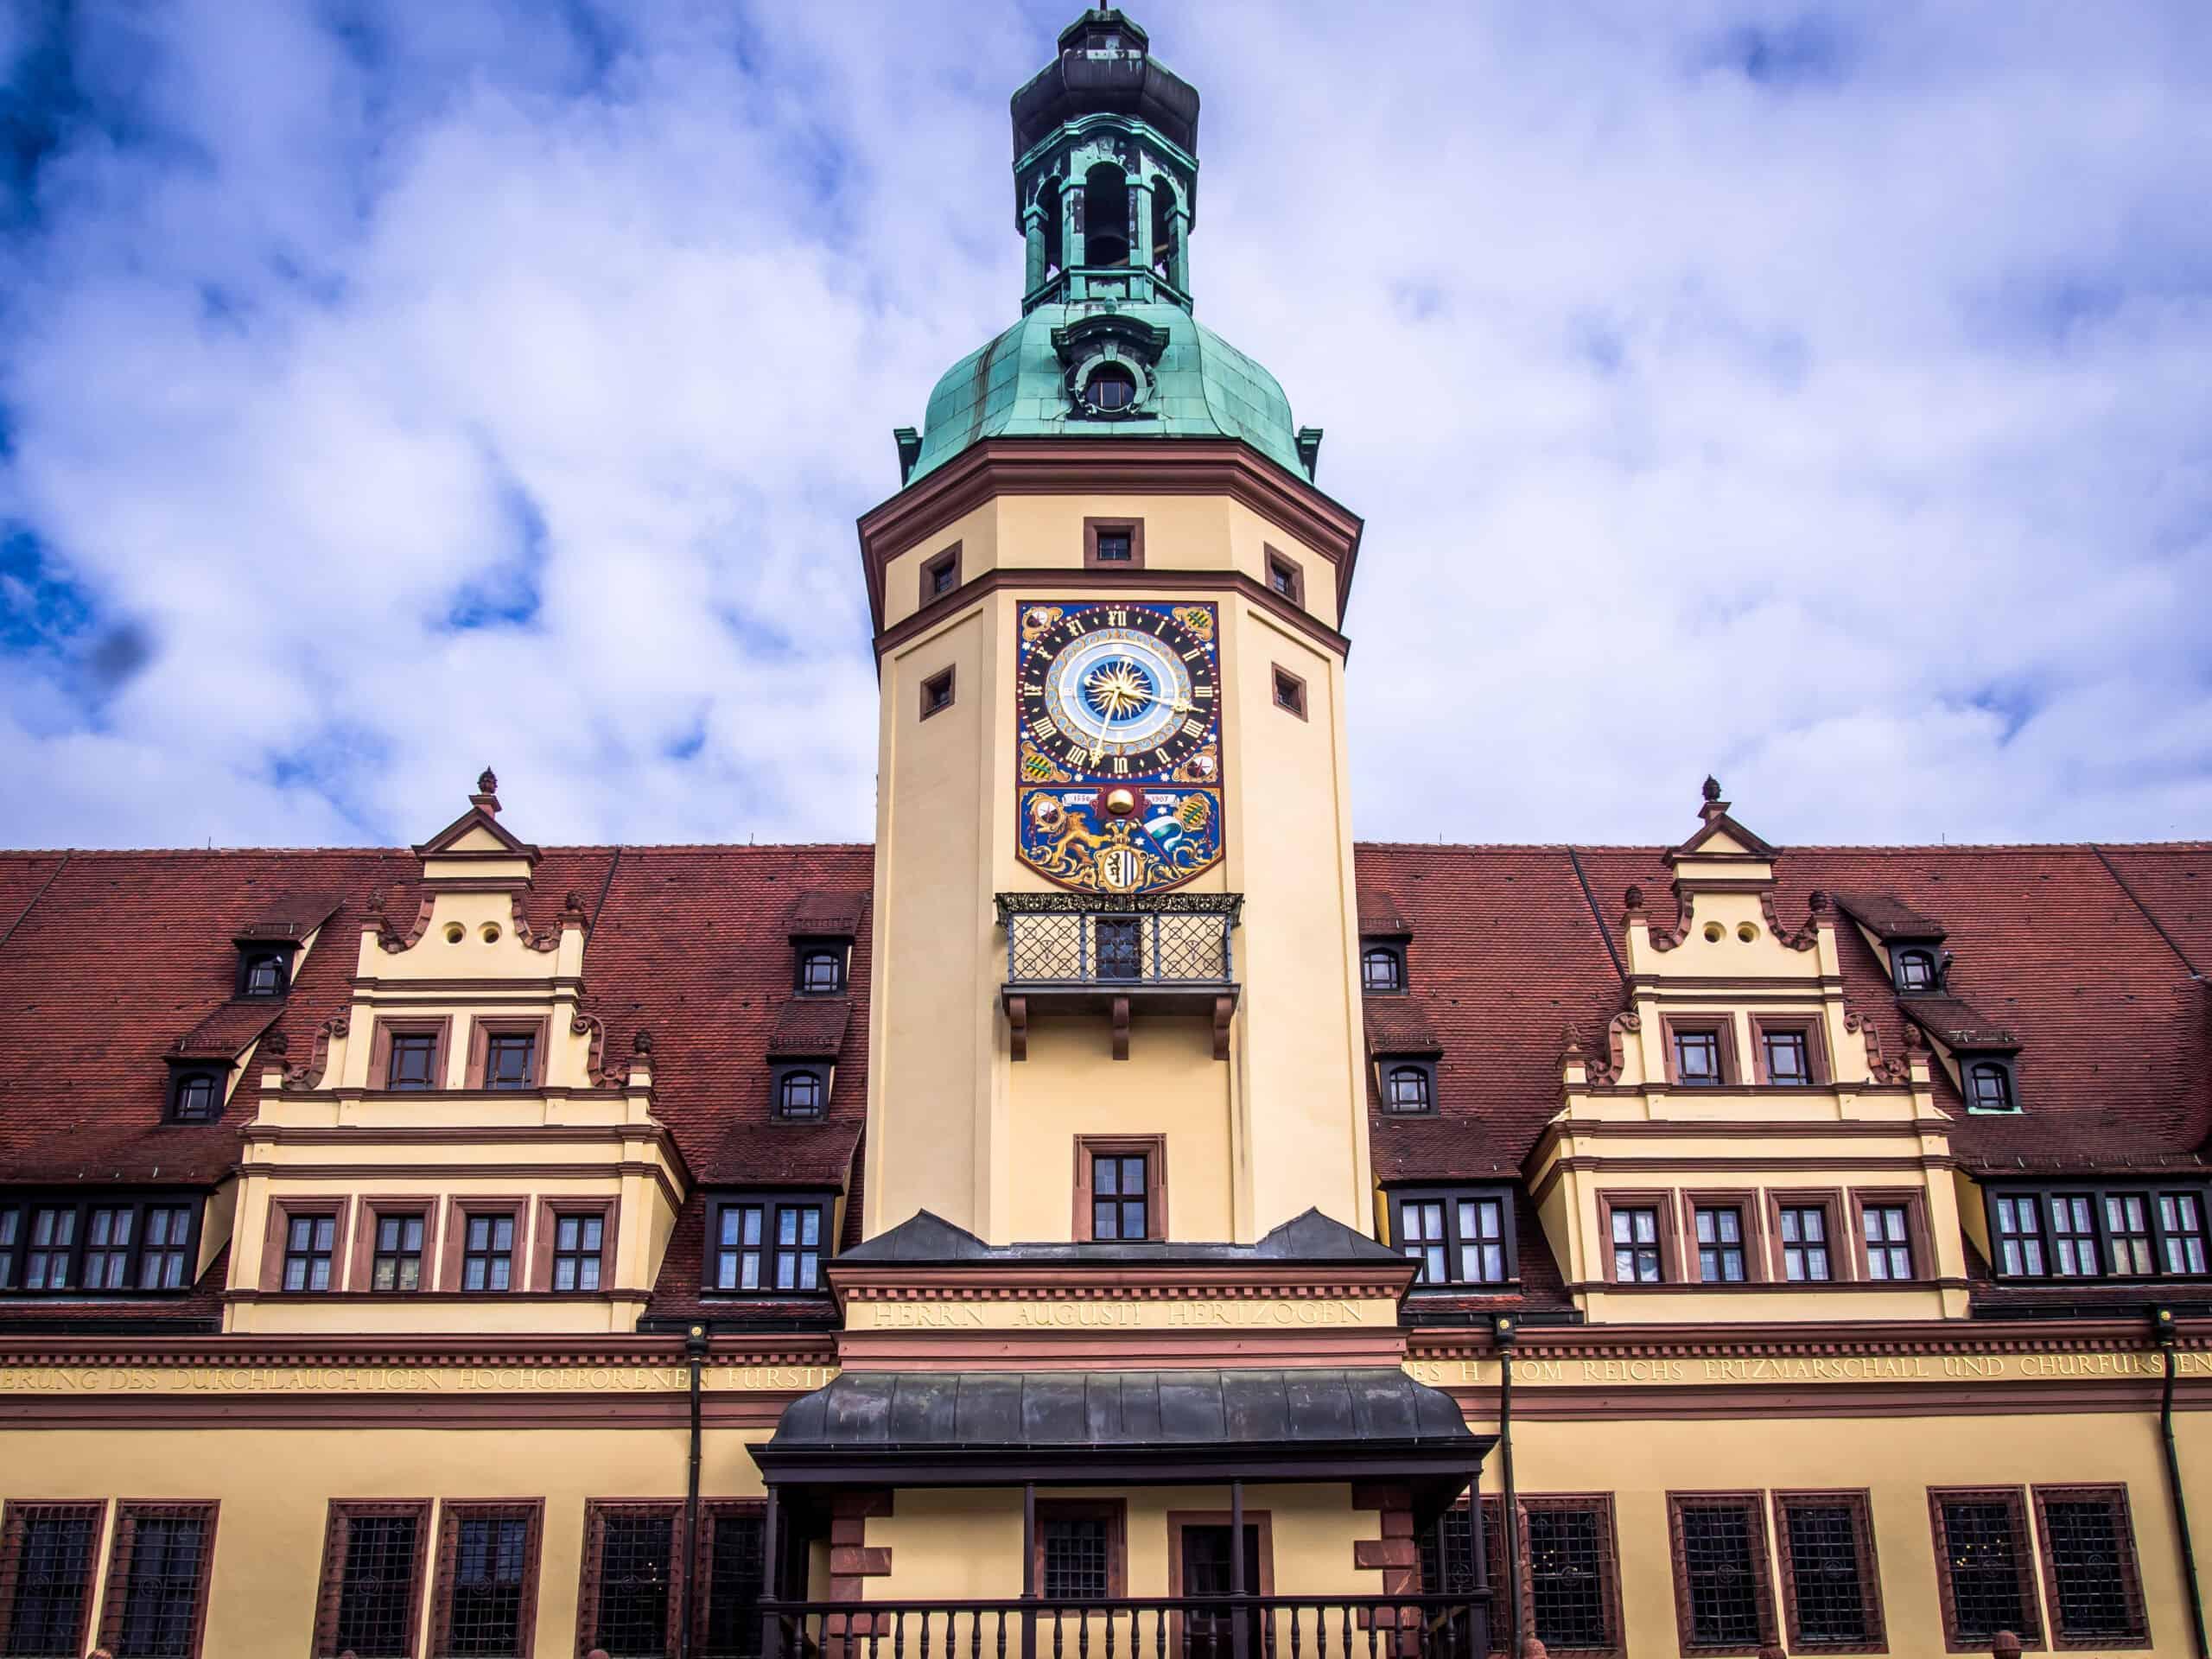 Altes Rathaus Leipzig www.leipzigfreetours.com